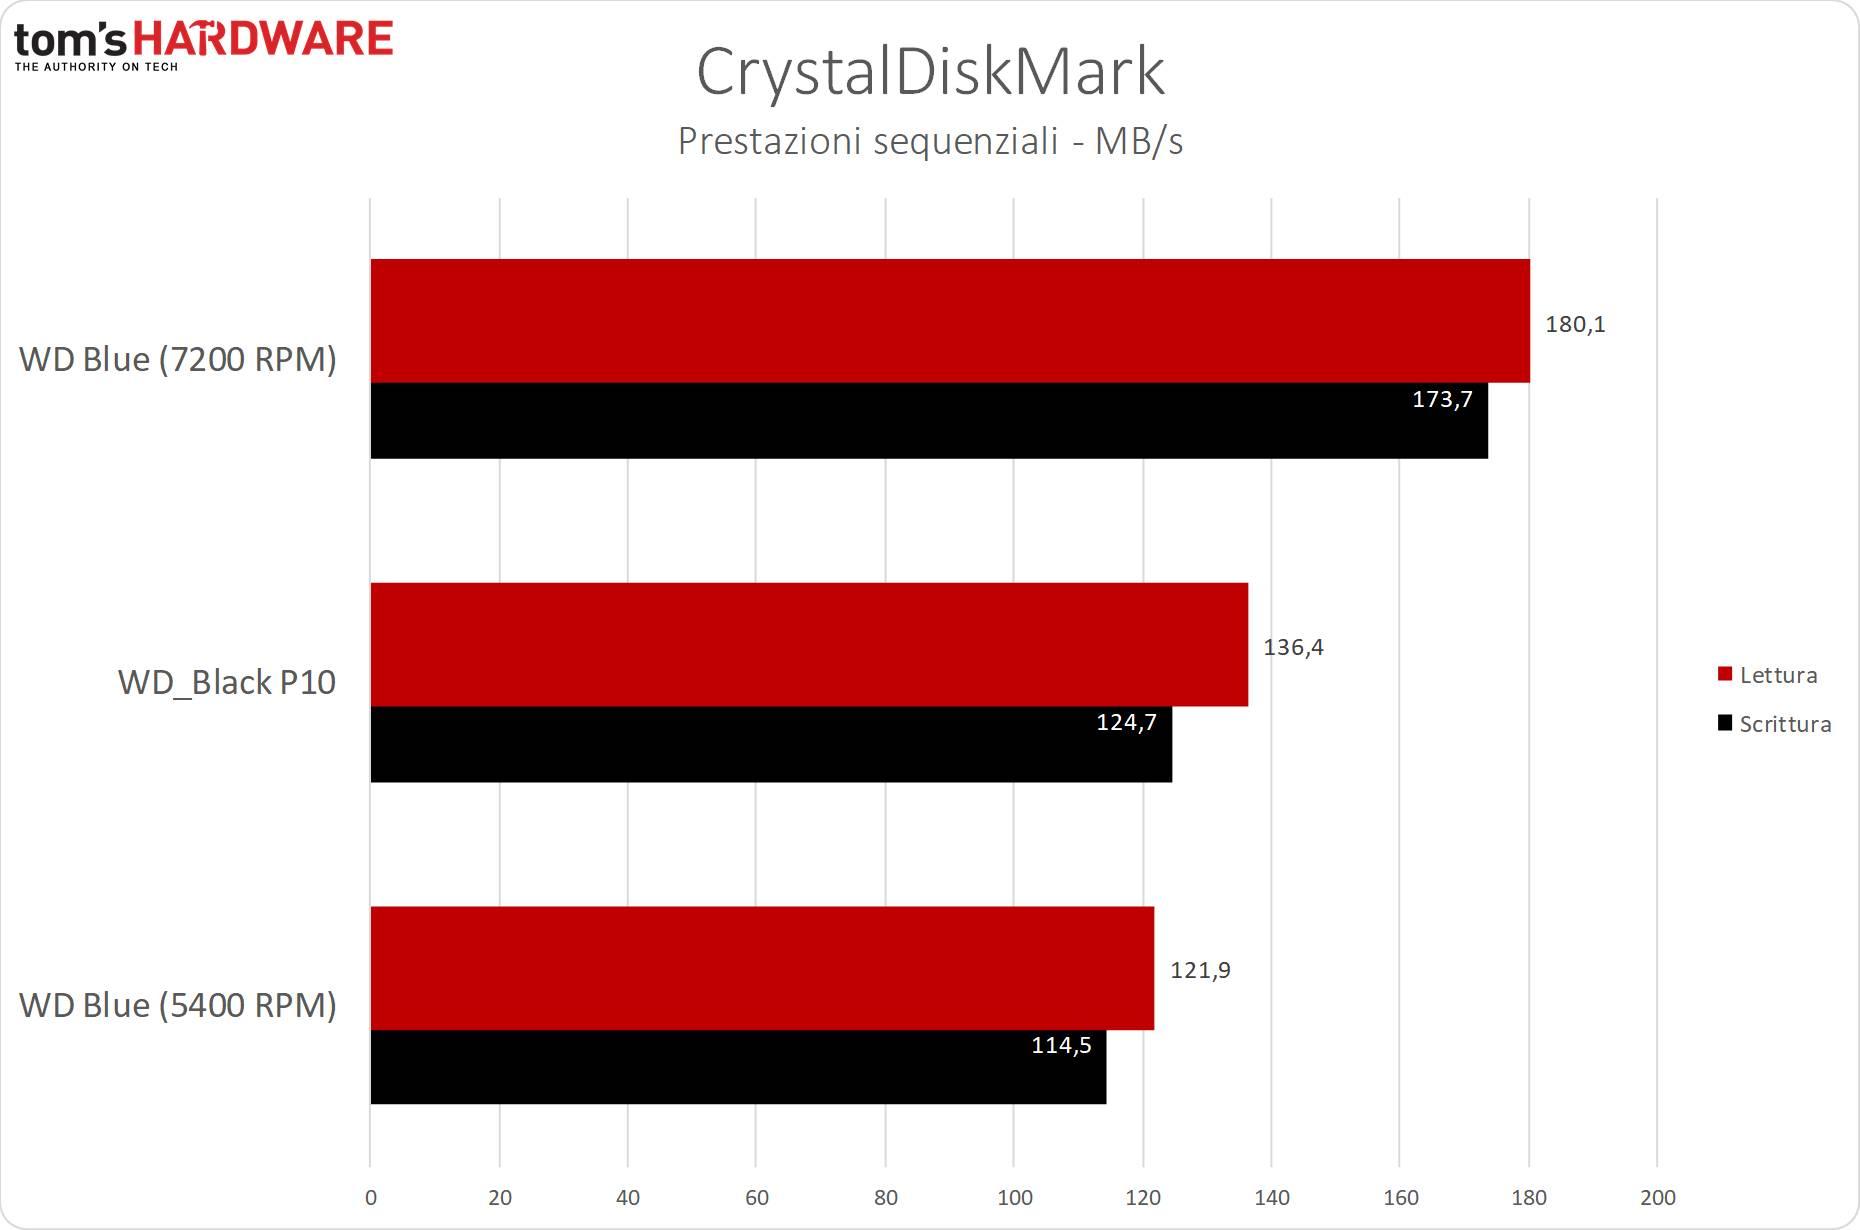 WD_Black P10 - CrystalDiskMark - Sequenziale